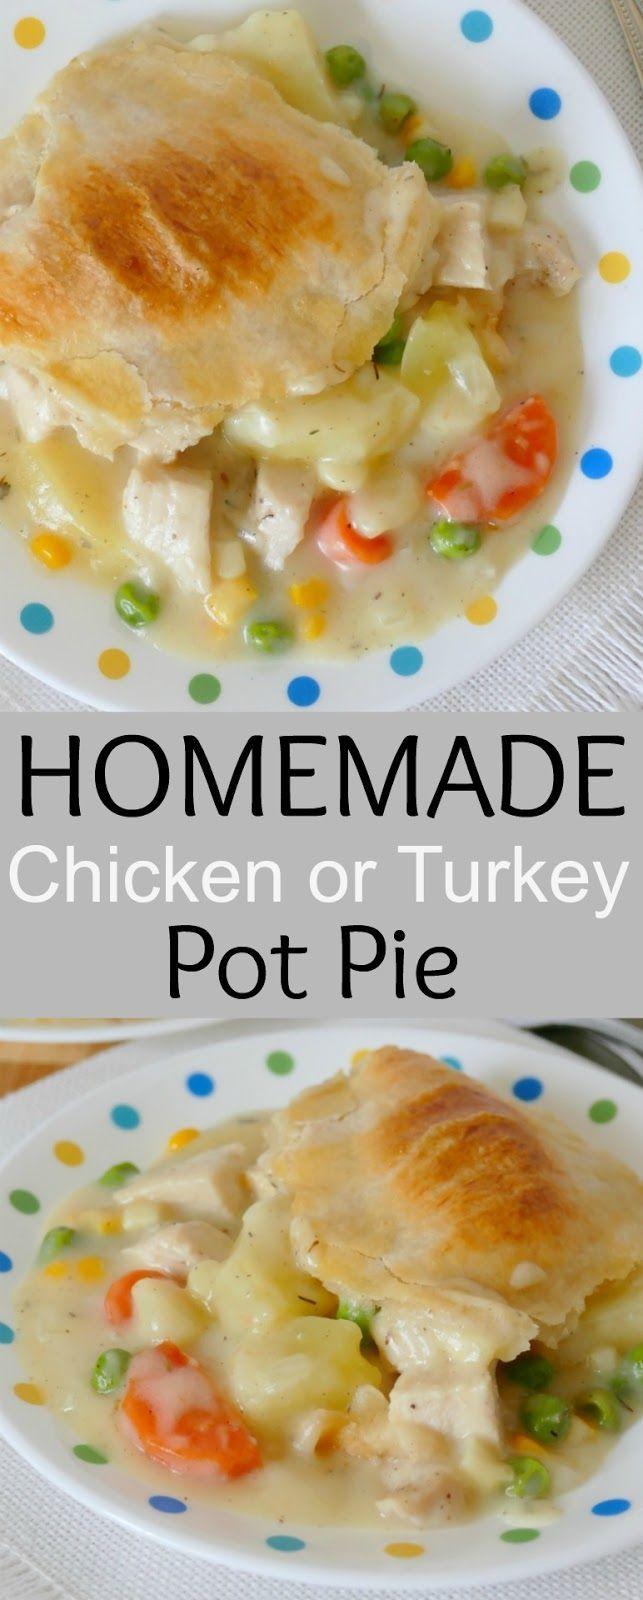 Homemade Chicken or Turkey Pot Pie Recipe #dinnerideas2019